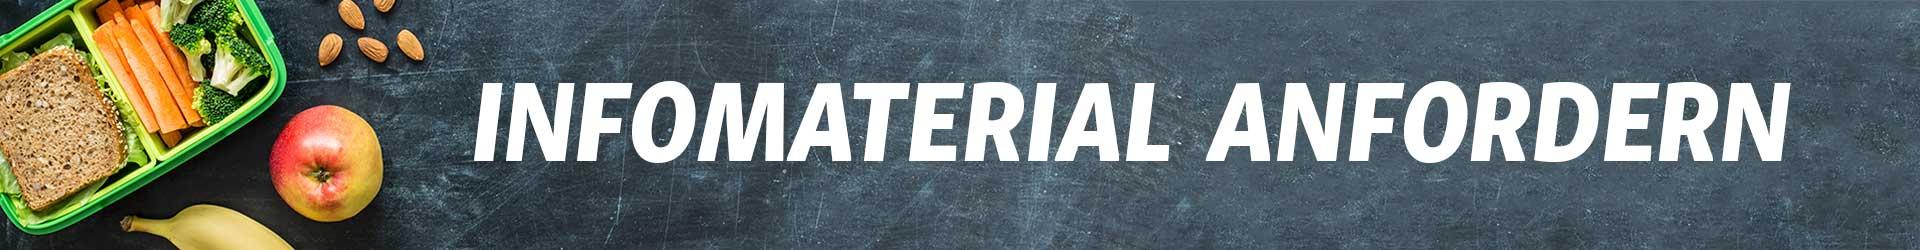 Infomaterial anfordern Banner - Ernährungsberater